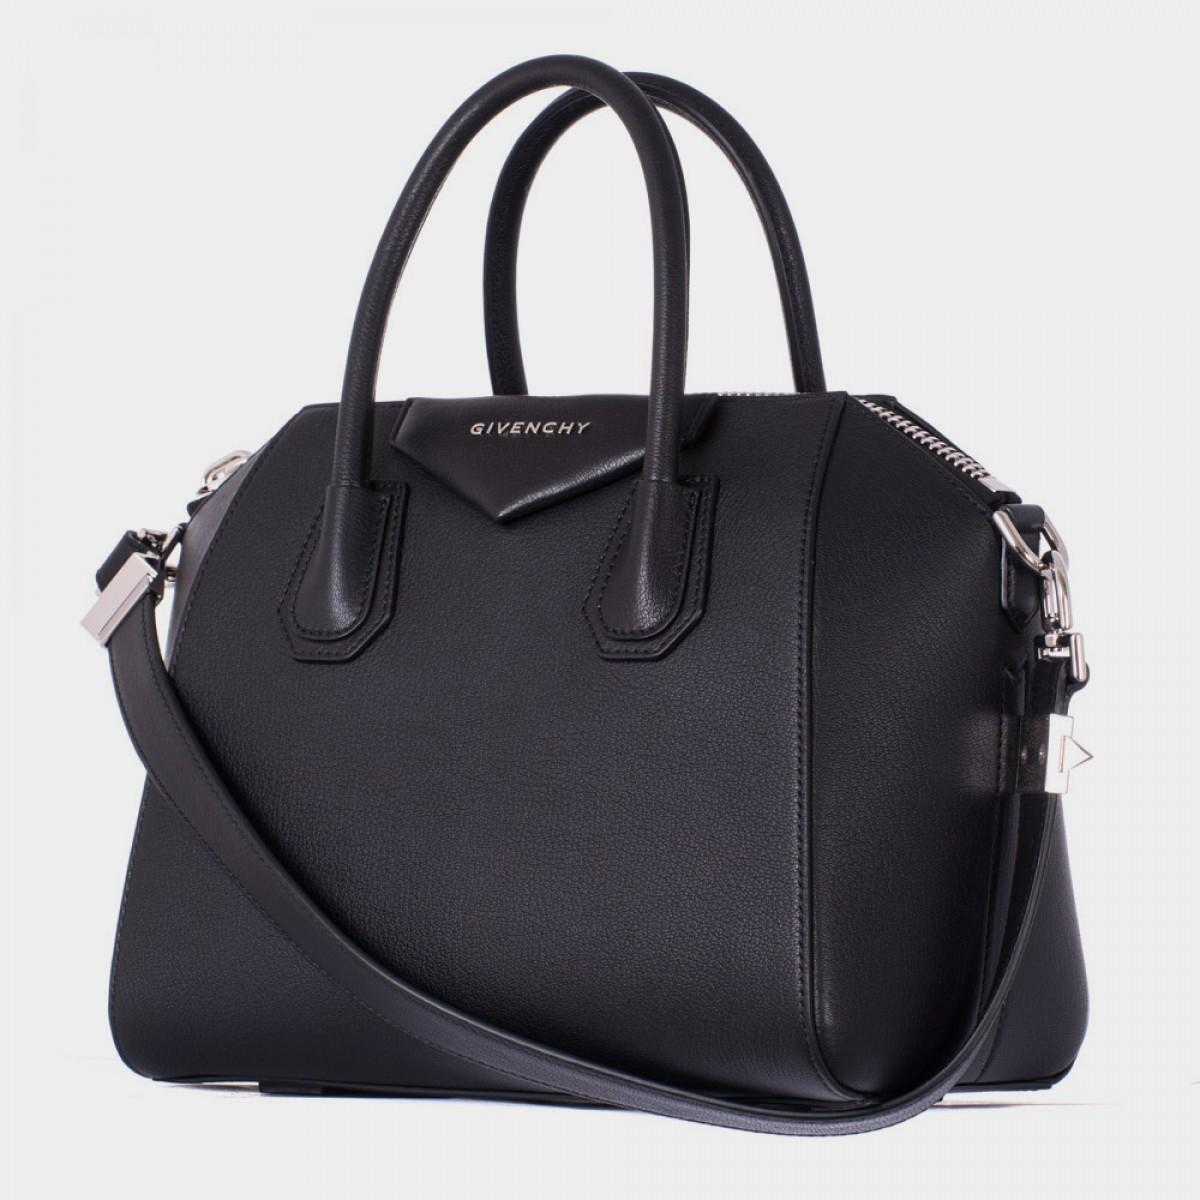 a1cc36d7b974 Givenchy Antigona Small Tote in Black